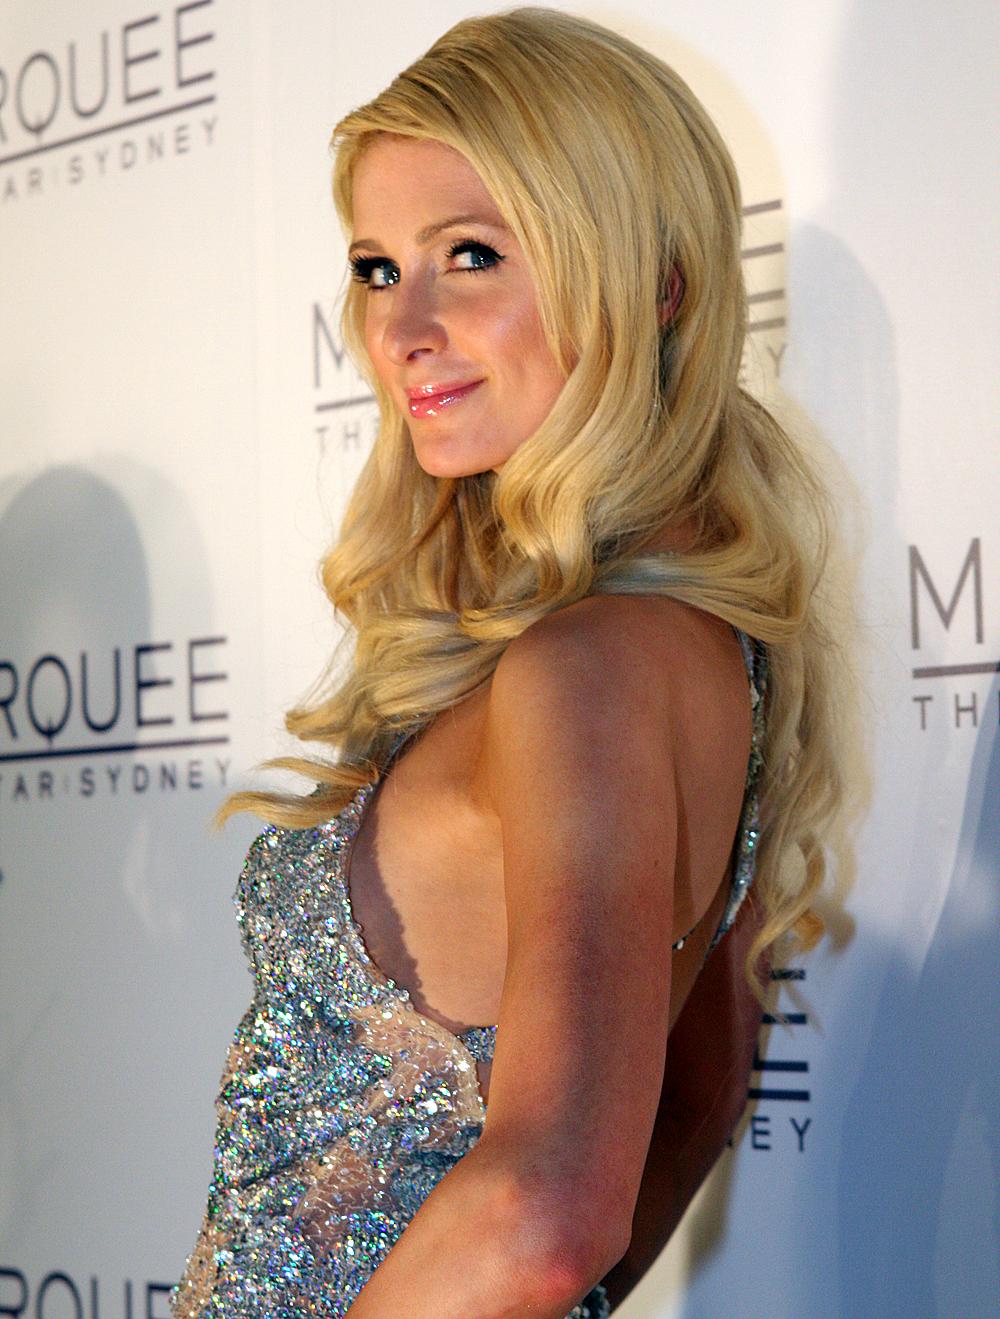 File:Paris Hilton 2012.jpg - Wikipedia, the free encyclopedia Paris Hilton